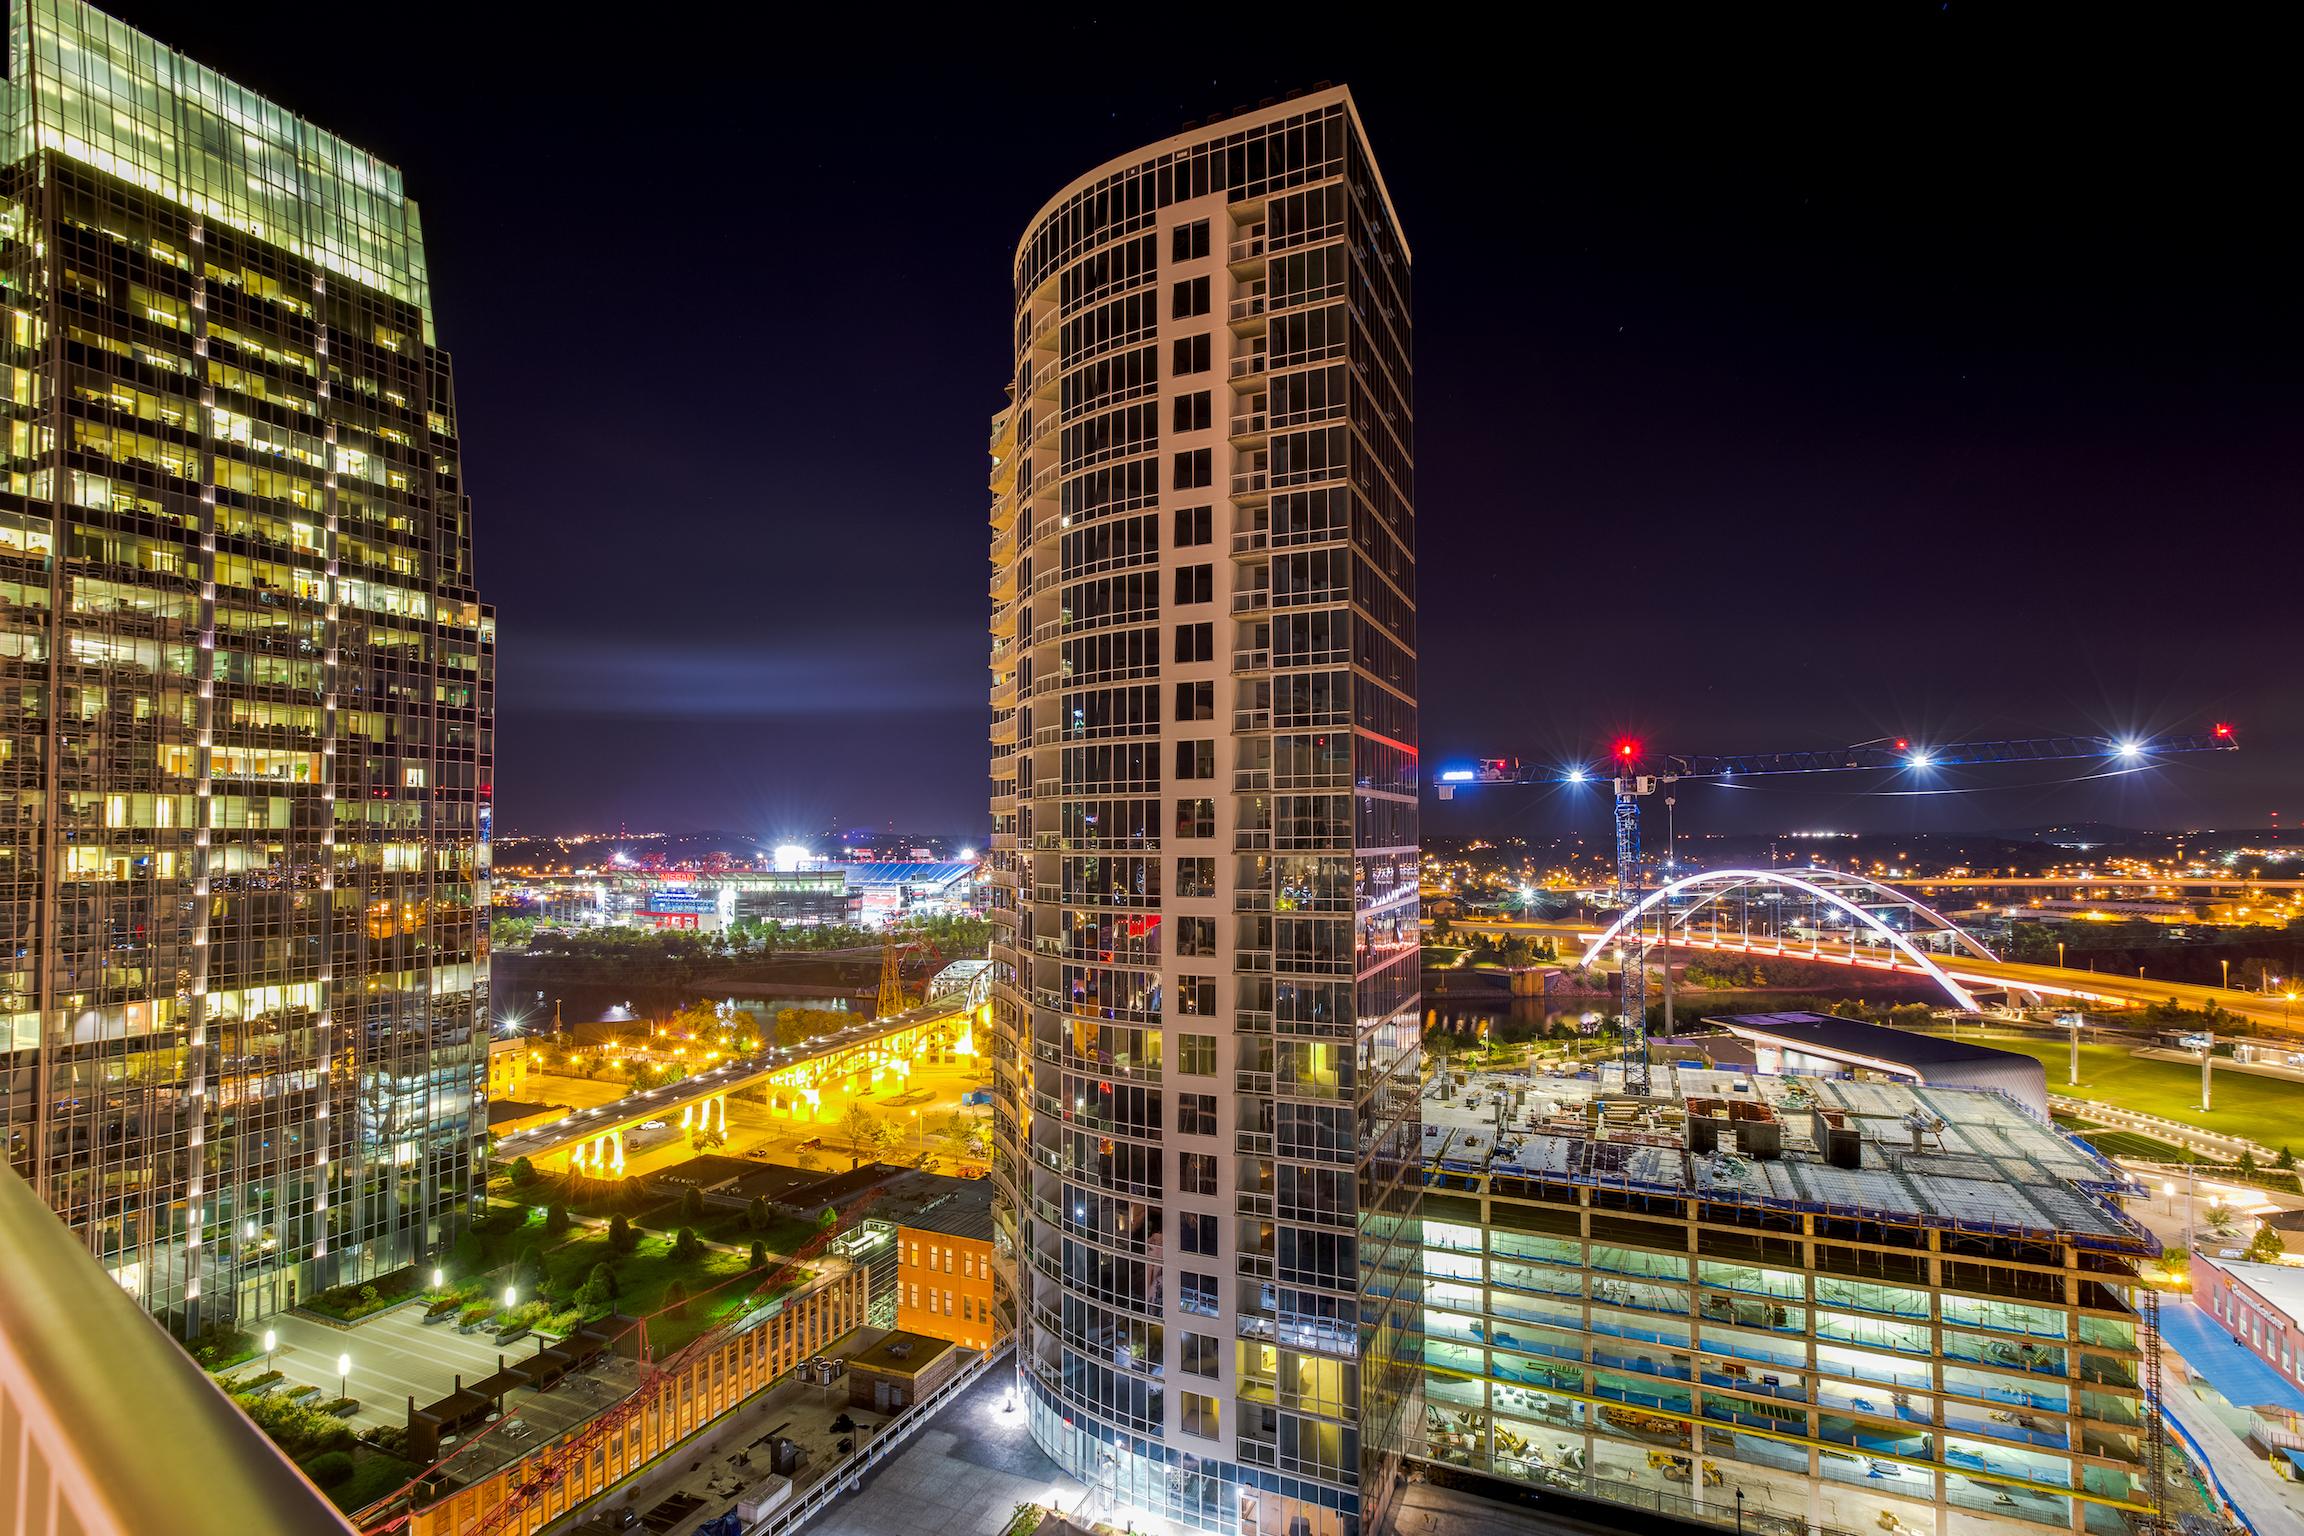 domophotos real estate twilight photography - Downtown Nashville, TN